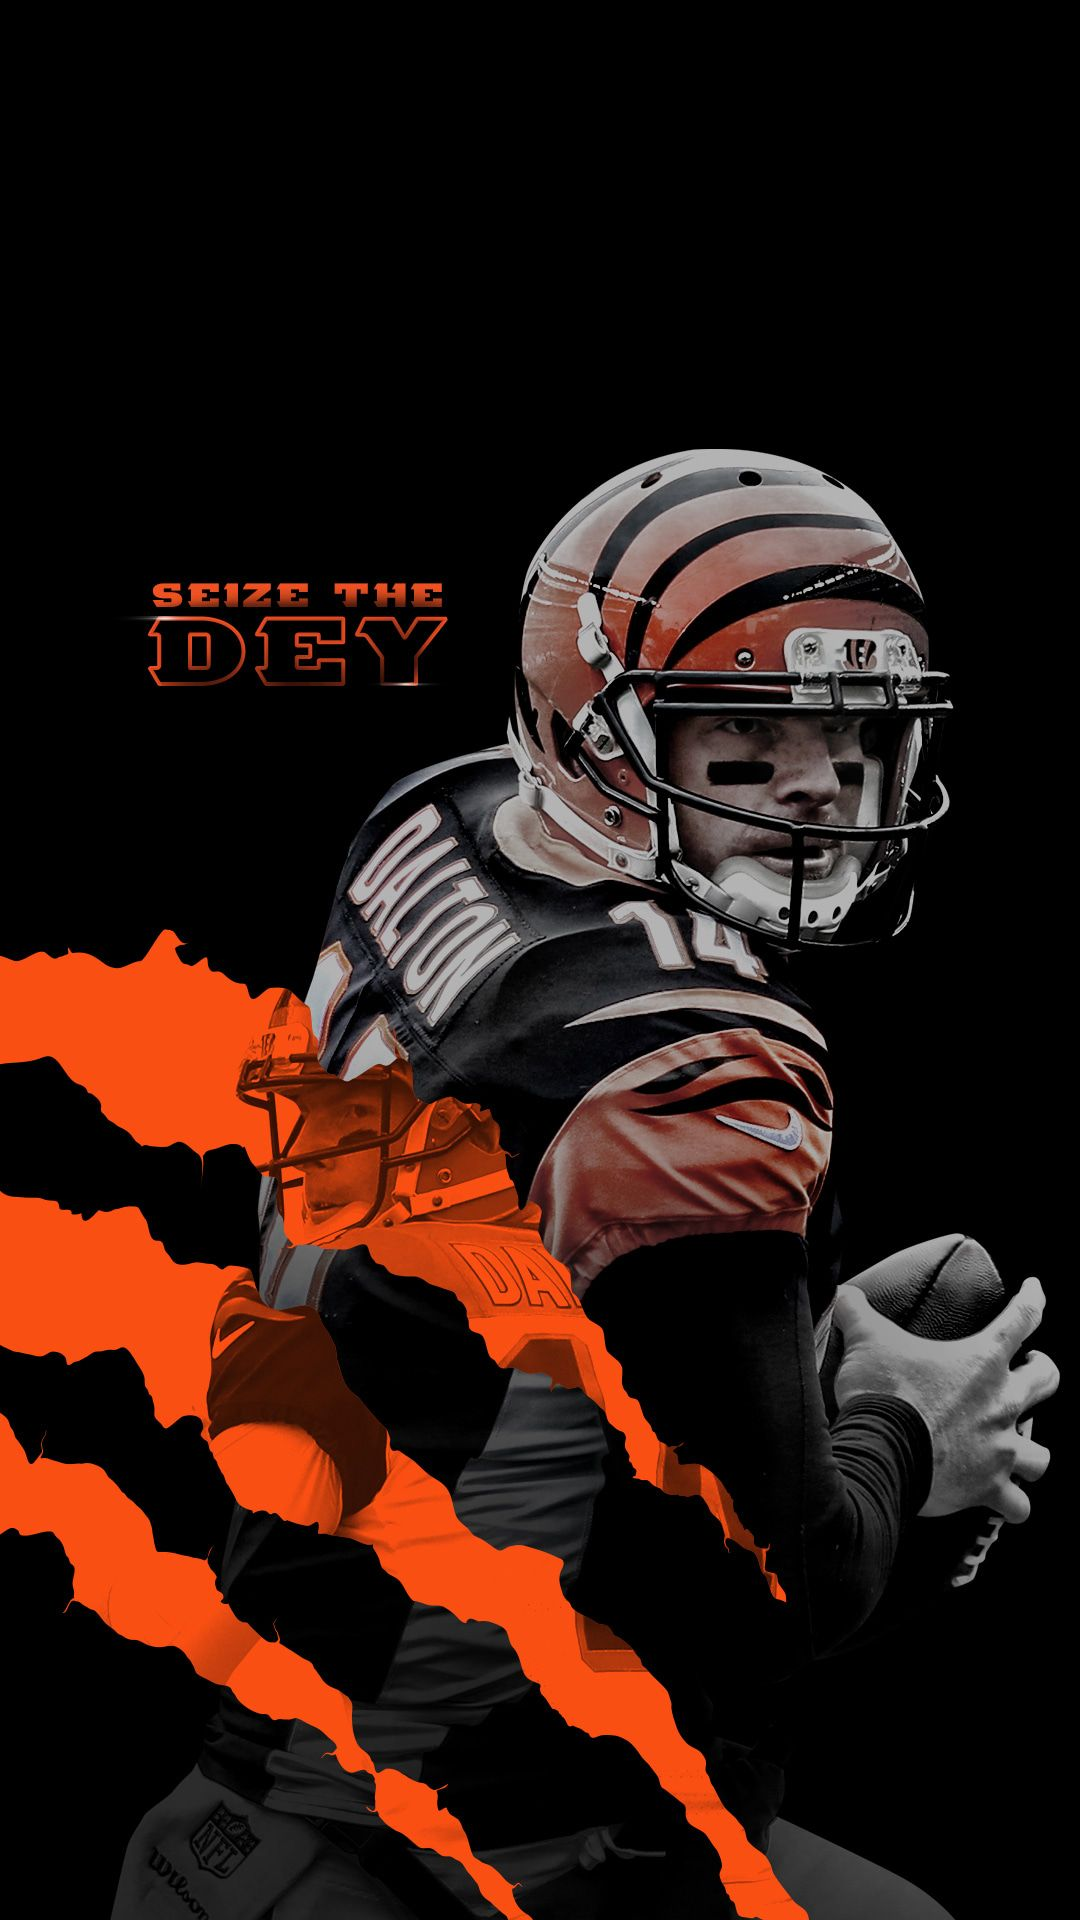 American Football Wallpaper Iphone In 2020 Football Wallpaper Football Wallpaper Iphone Cincinnati Bengals